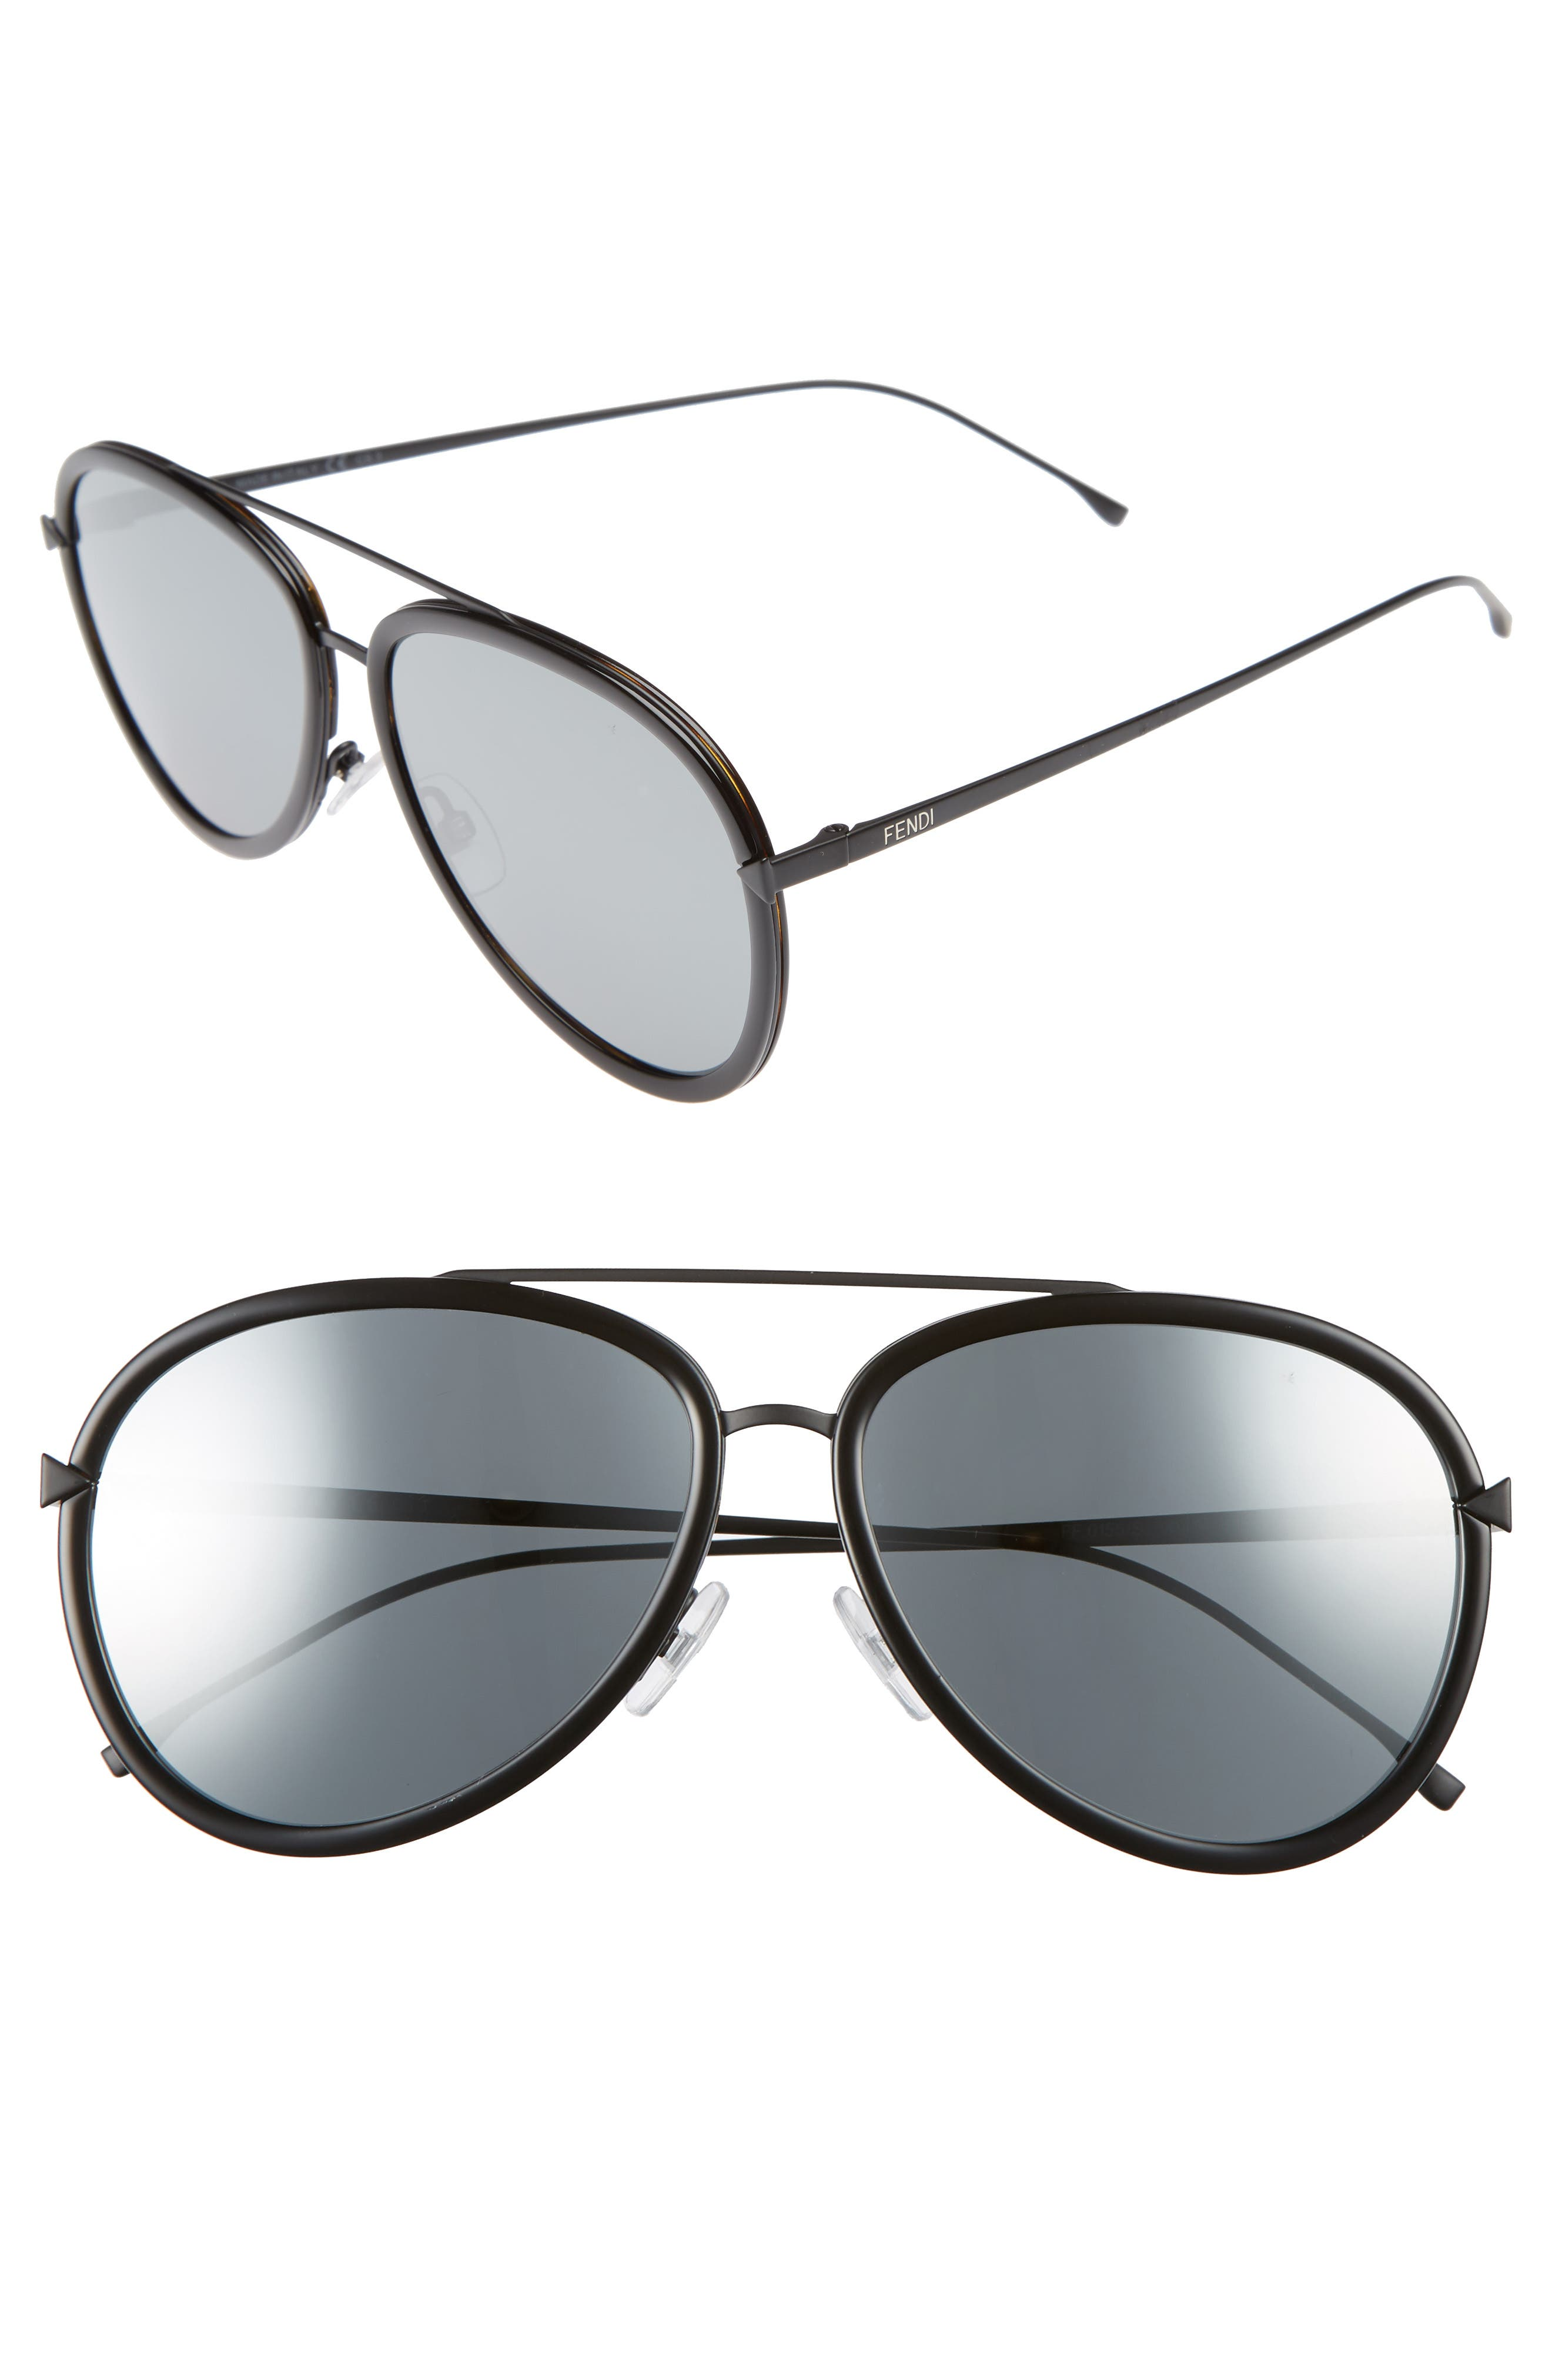 Alternate Image 1 Selected - Fendi 57mm Mirrored Lens Aviator Sunglasses